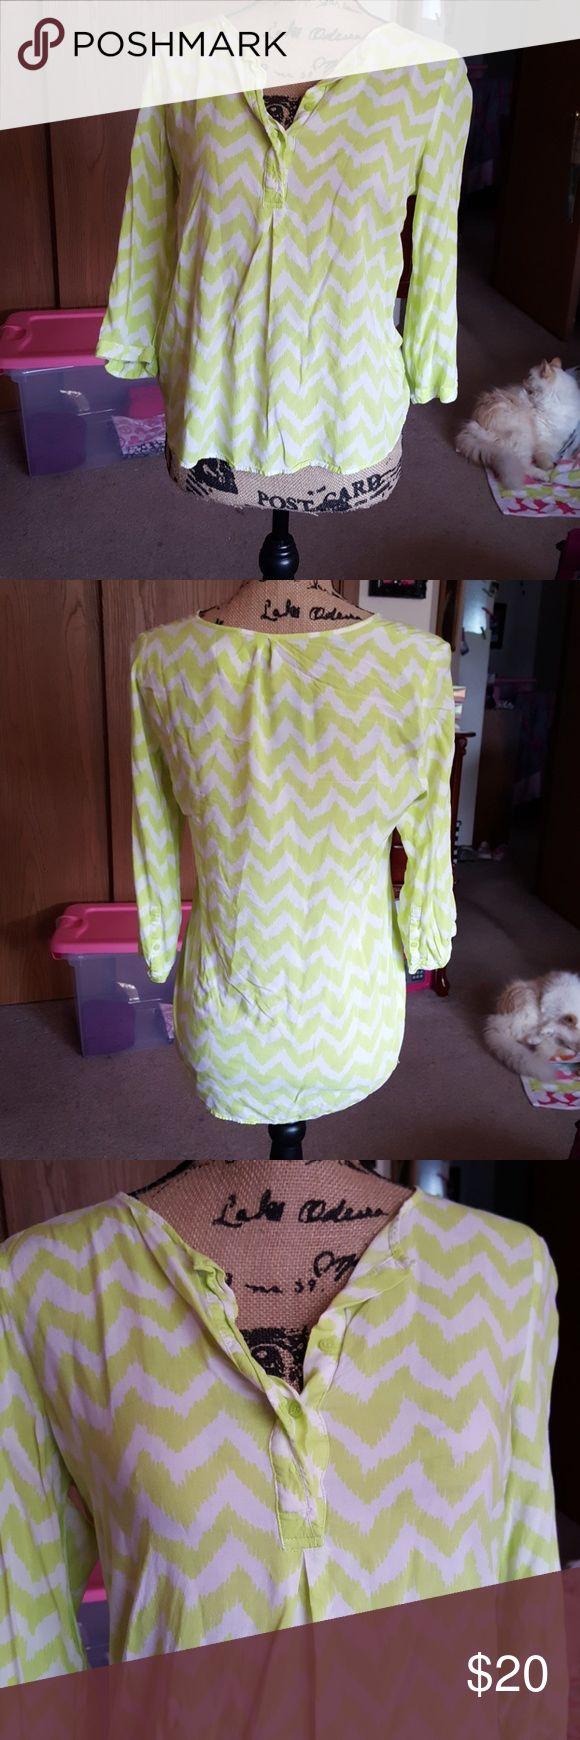 Neon yellow chevron shirt. Like New. Small Neon yellow chevron shirt. Like New. Small. 100% rayon. High low type top. none Tops Blouses